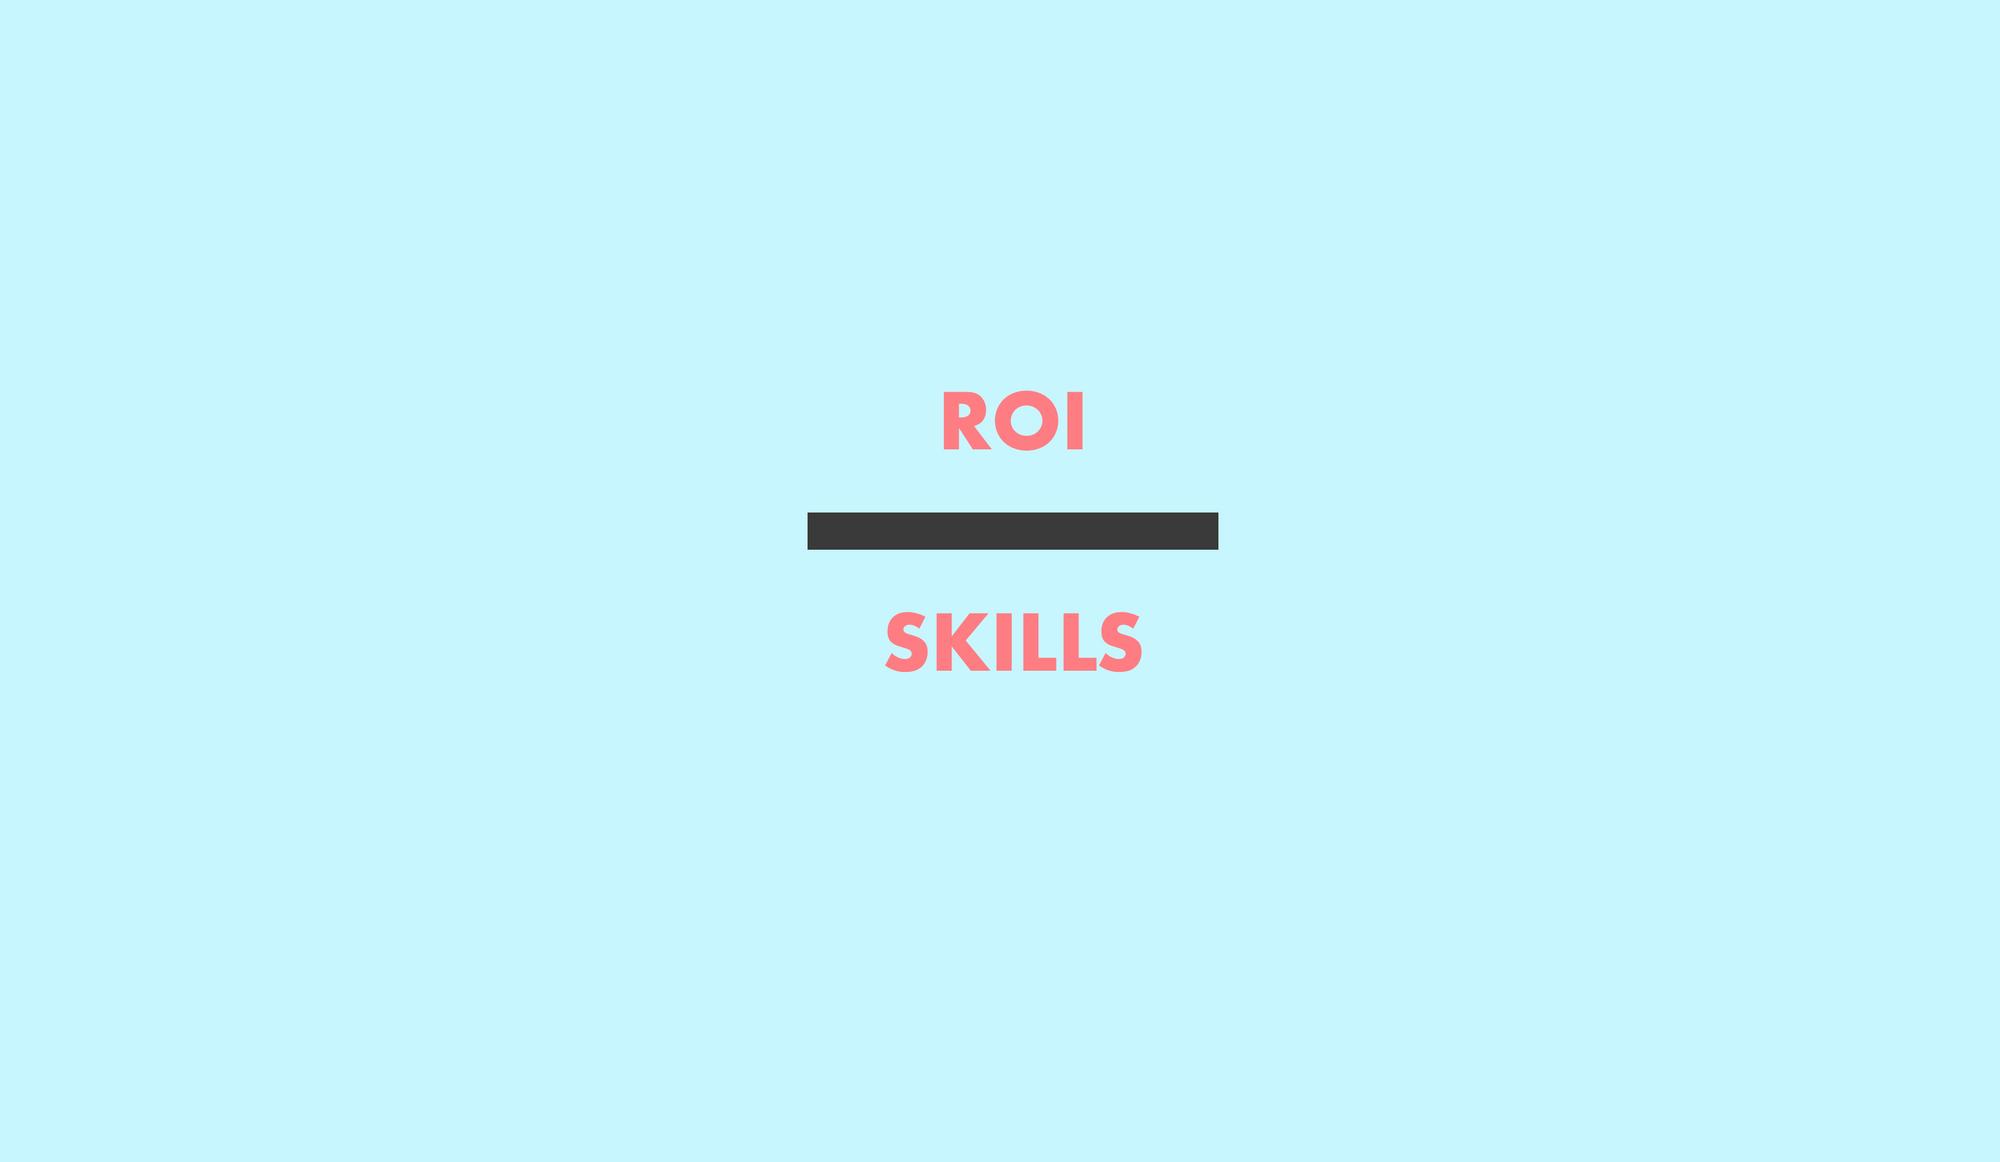 ROI over Skills - Coral texxt on light blue bg